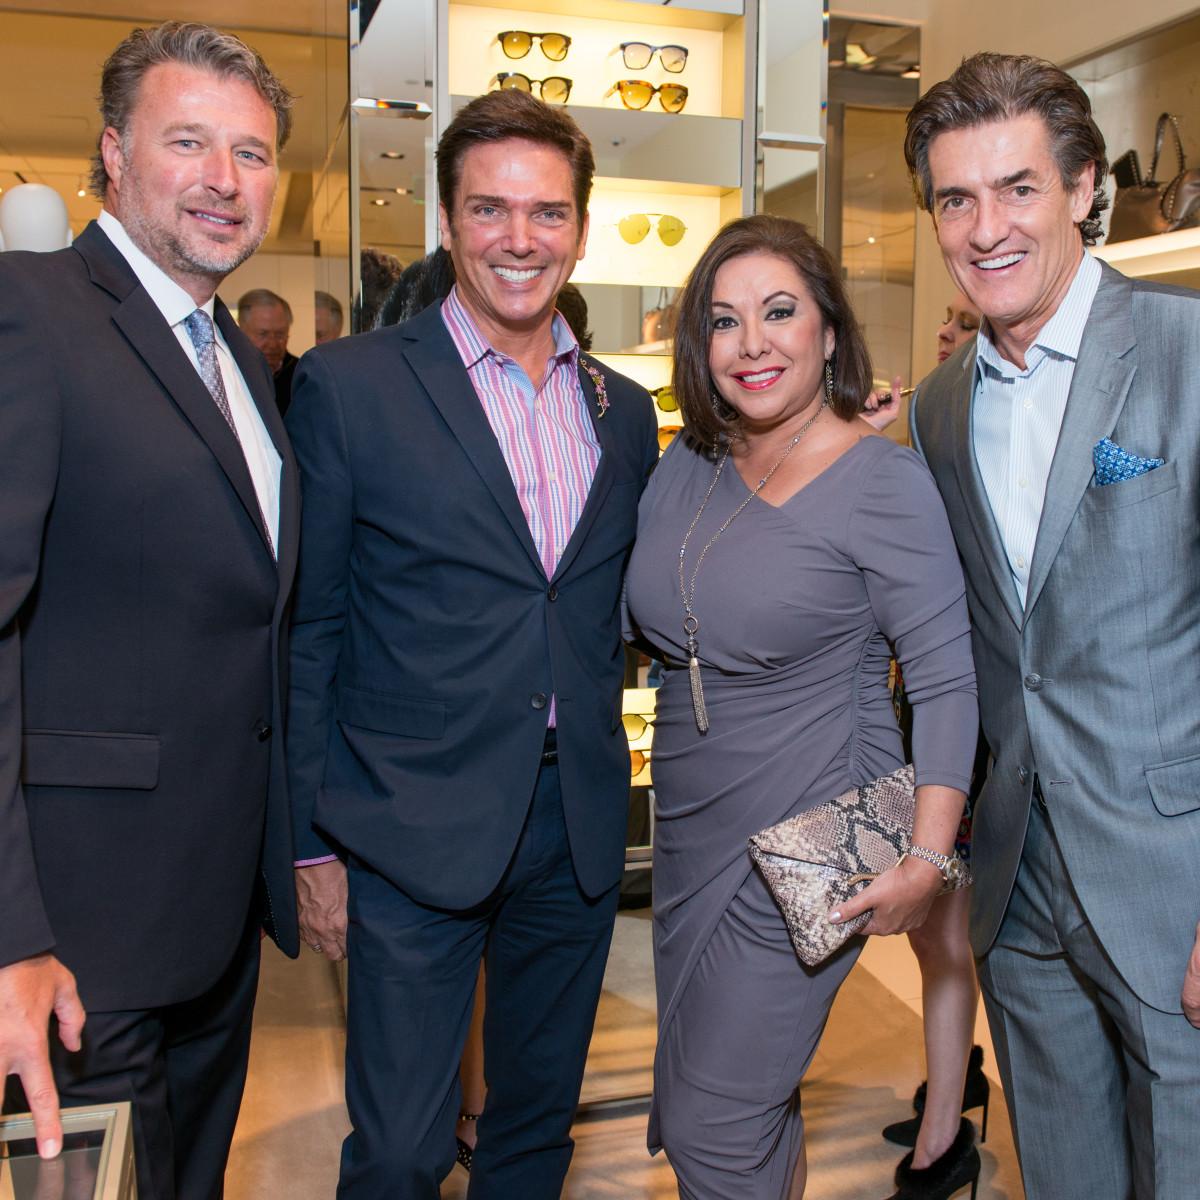 News, Shelby, Heart of Houston, Valentino, Sept. 2015, James Dorsett, Lenny Matuszewski, Debbie Festari, Nick Florescu